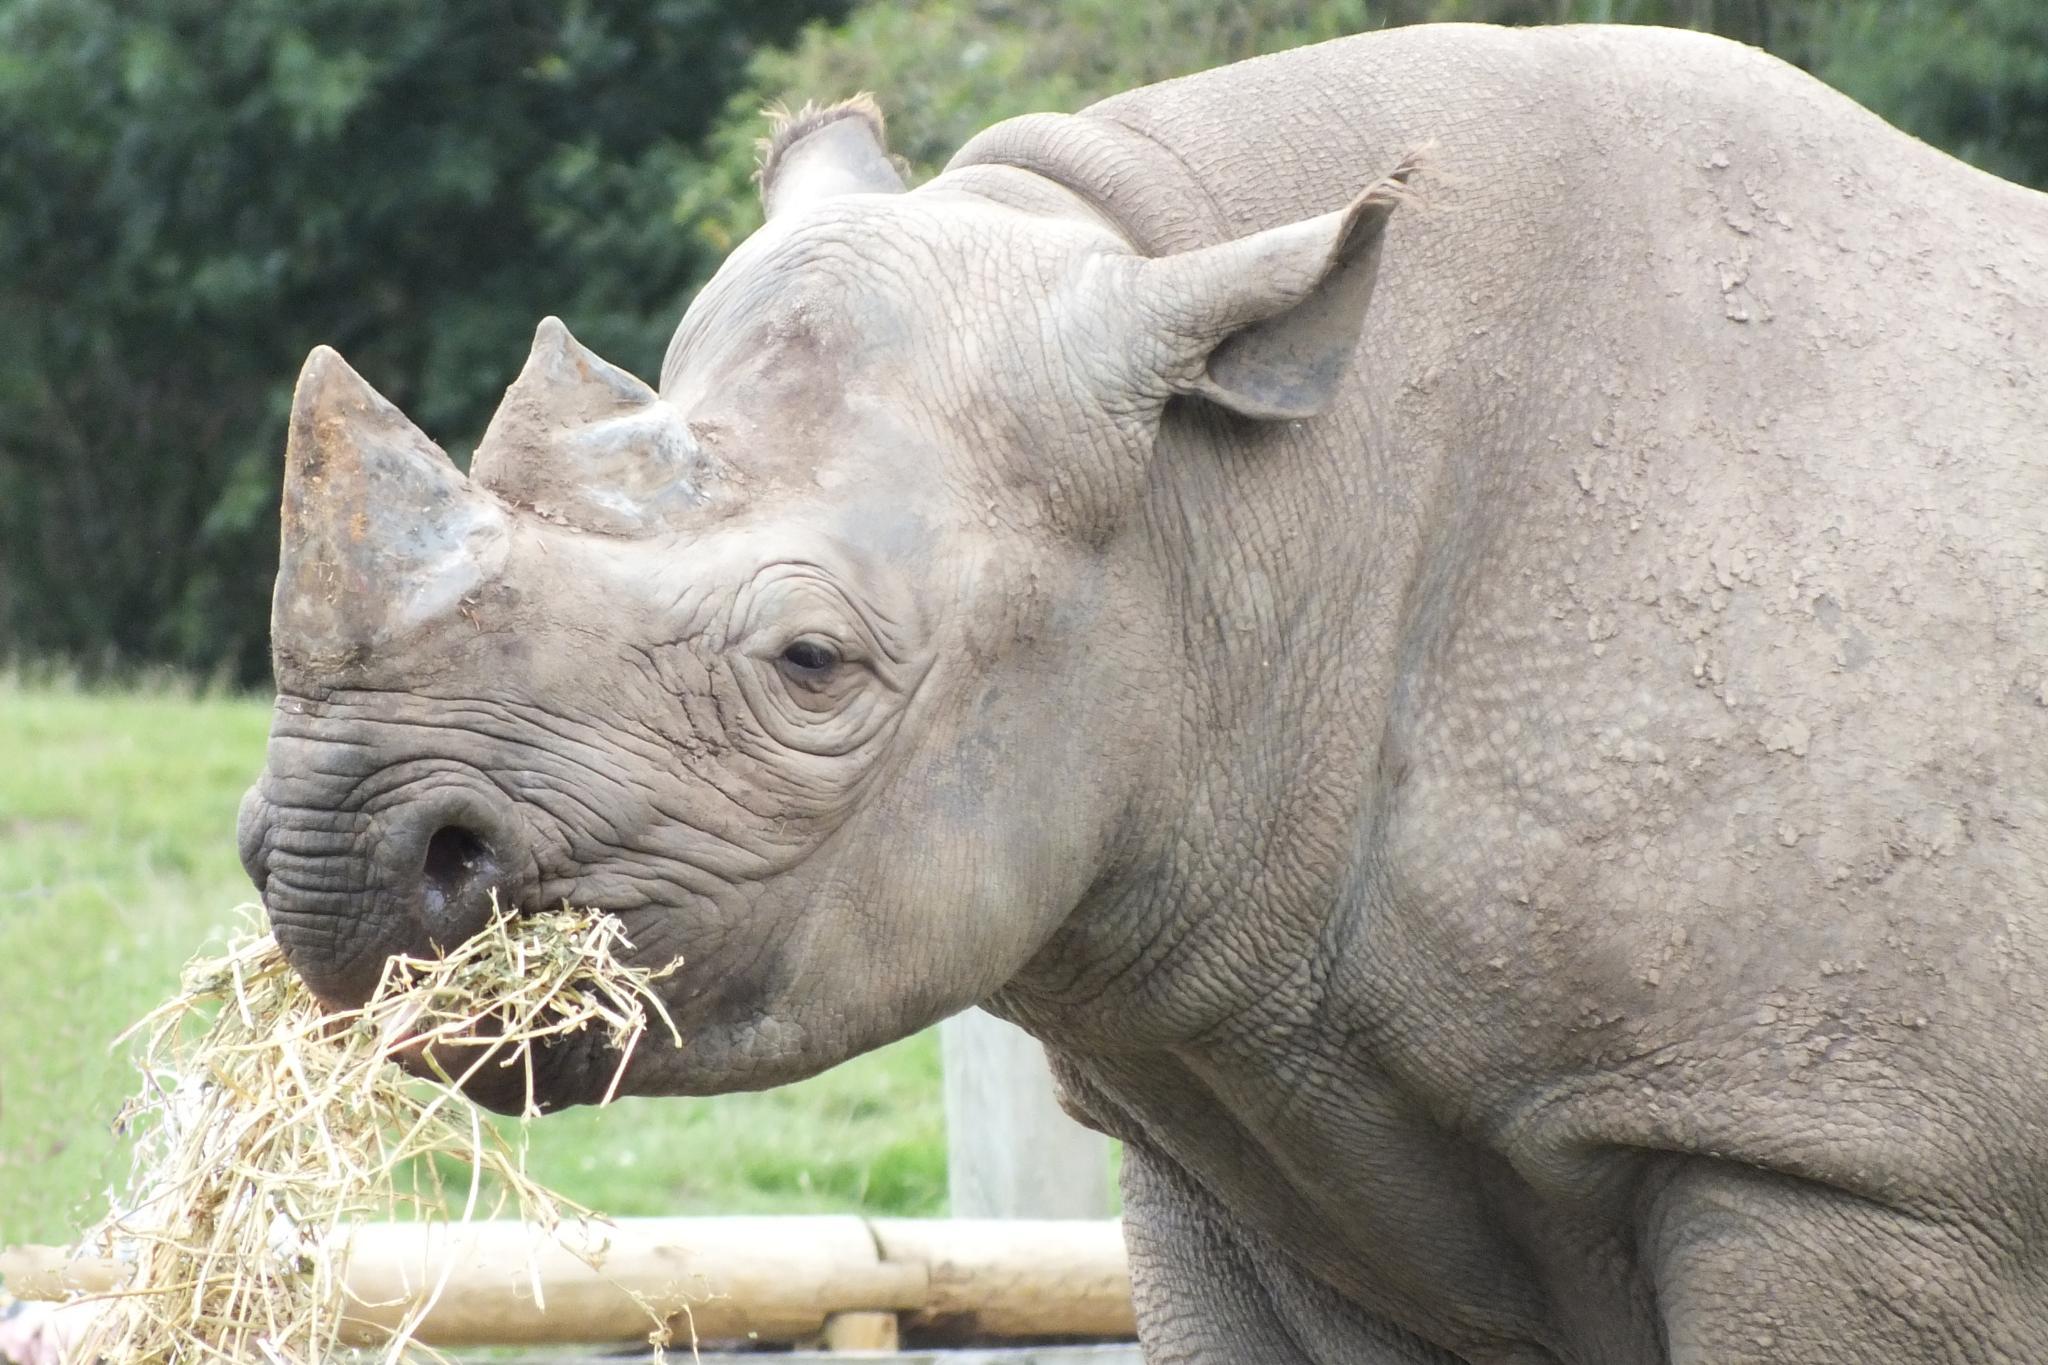 Rhino by jane.blackburn.58